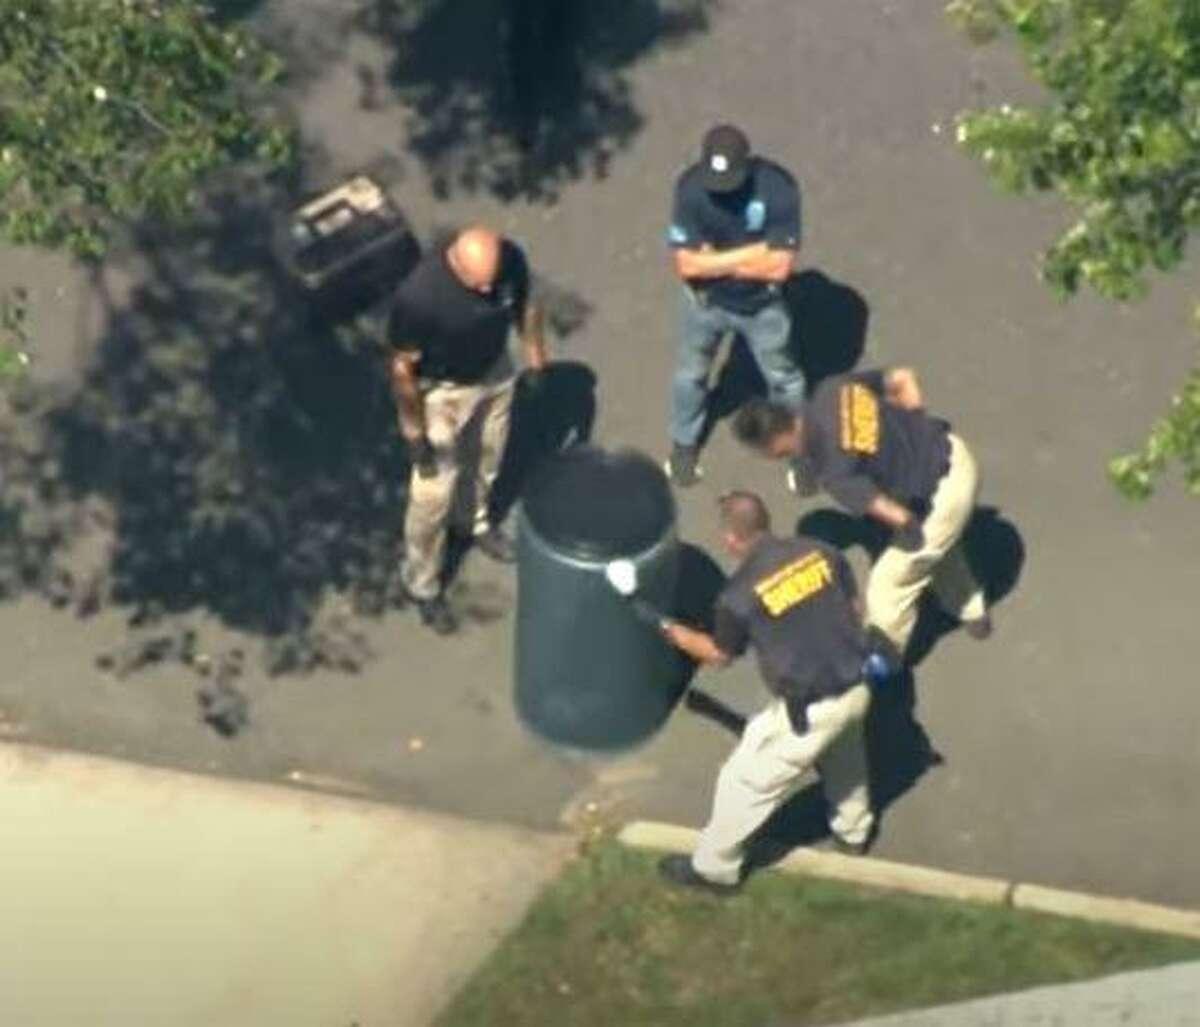 Bergen County investigators dusting a barrel where Flanagan's body was found inside.